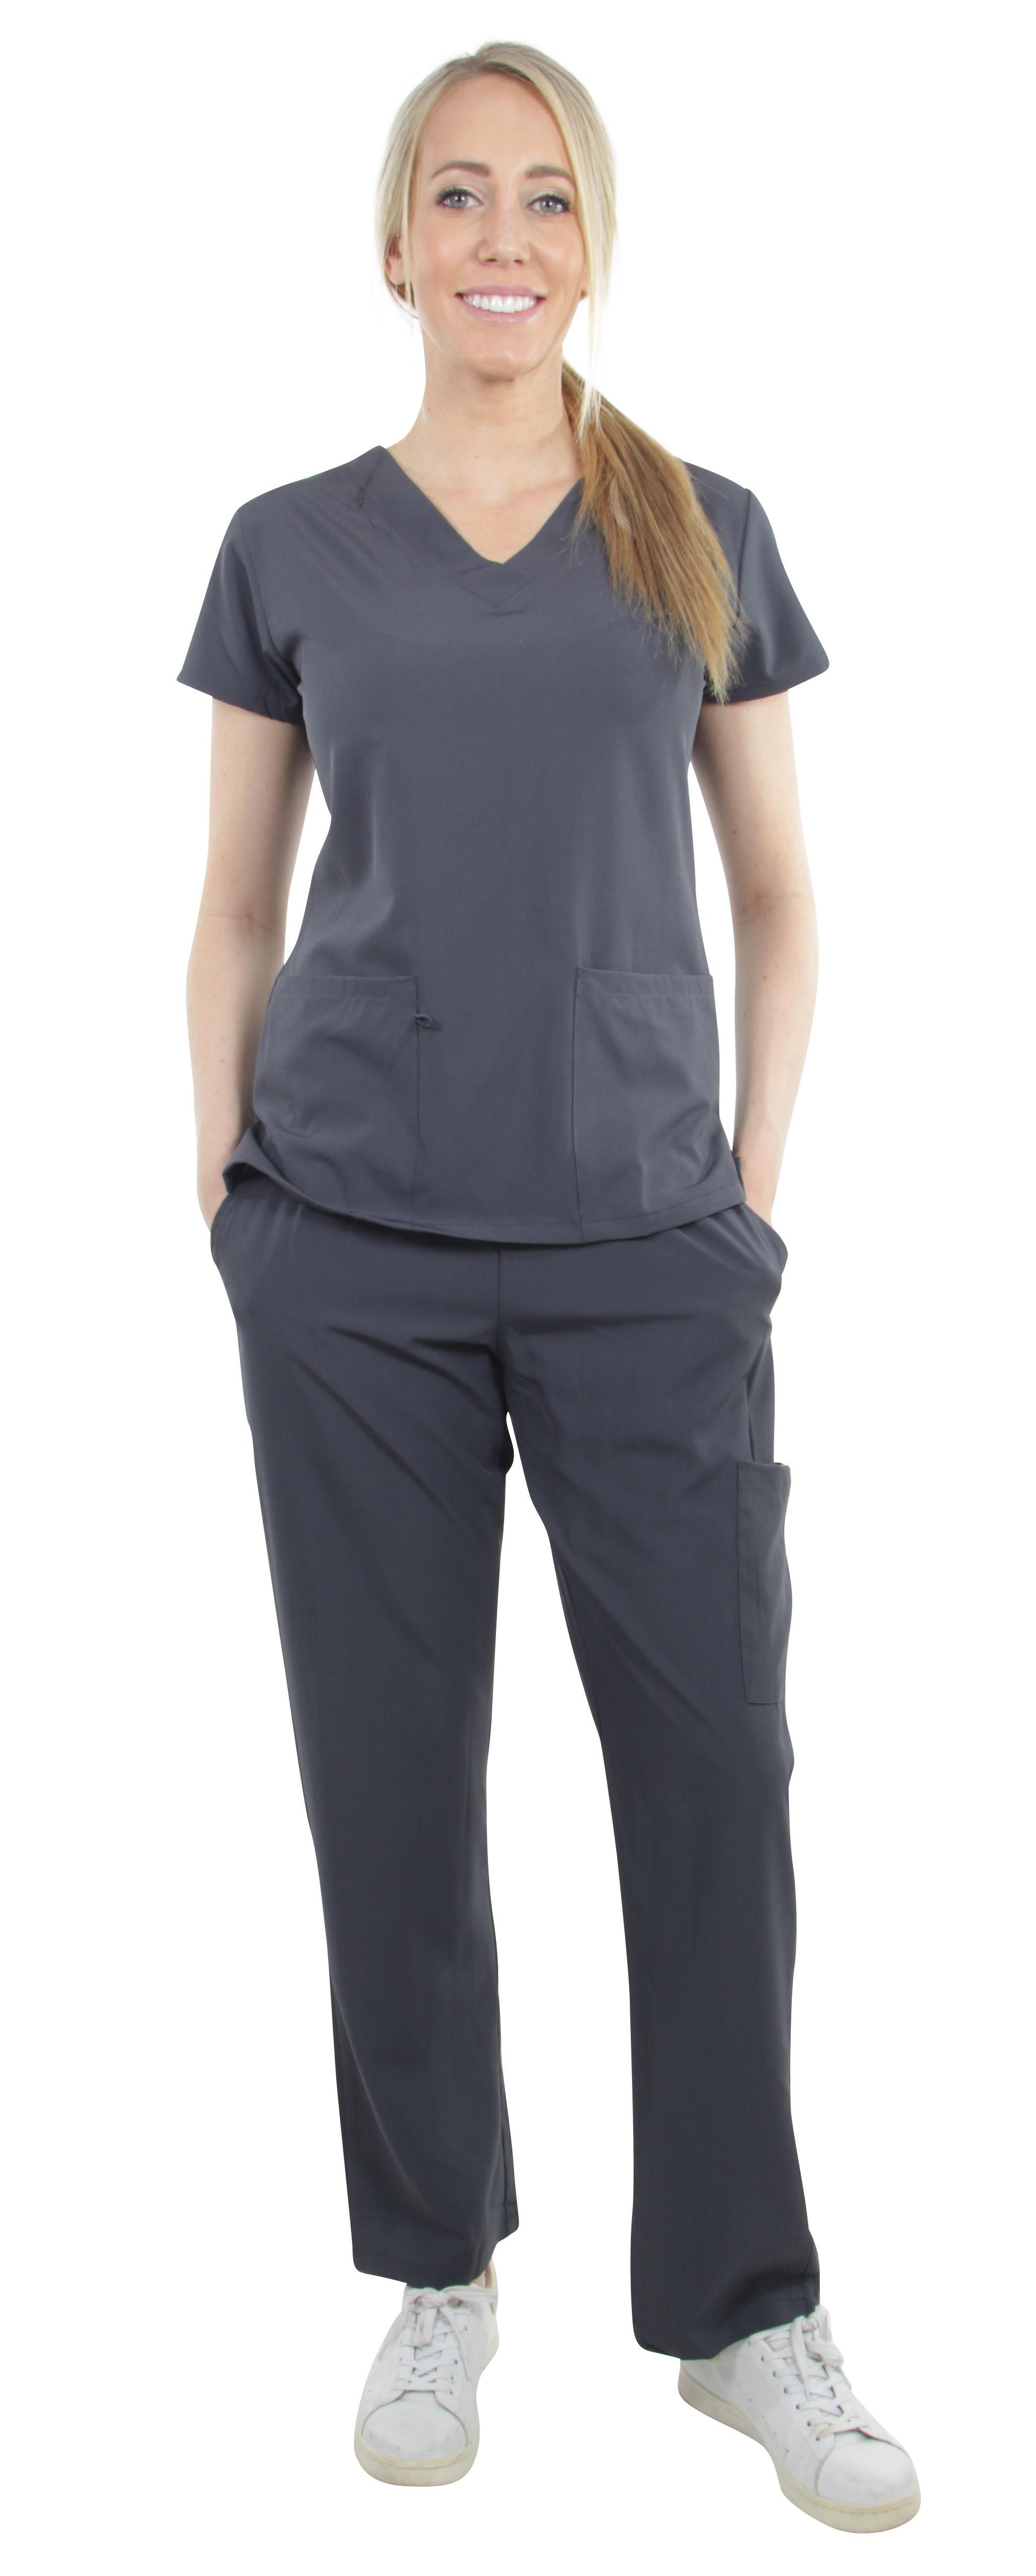 Unisex-Performance-Stretch-Medical-Uniform-Five-Pockets-V-Neck-Scrubs-Sets miniature 45